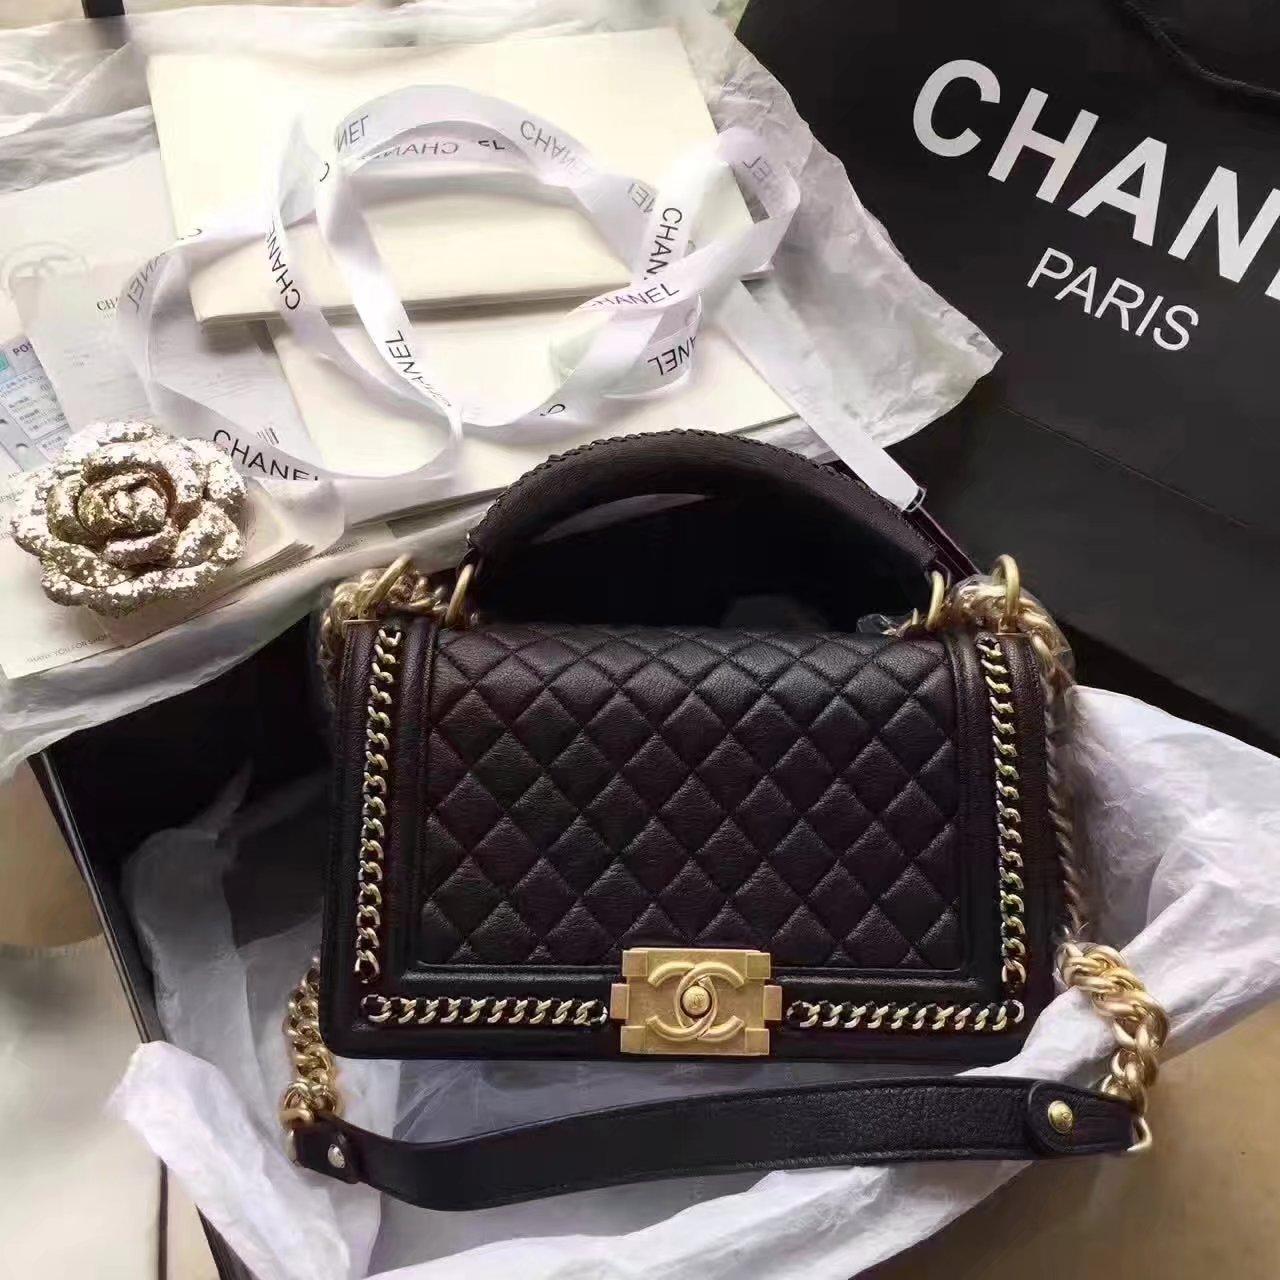 Chanel Boy Chanel Black Handbag With Handle